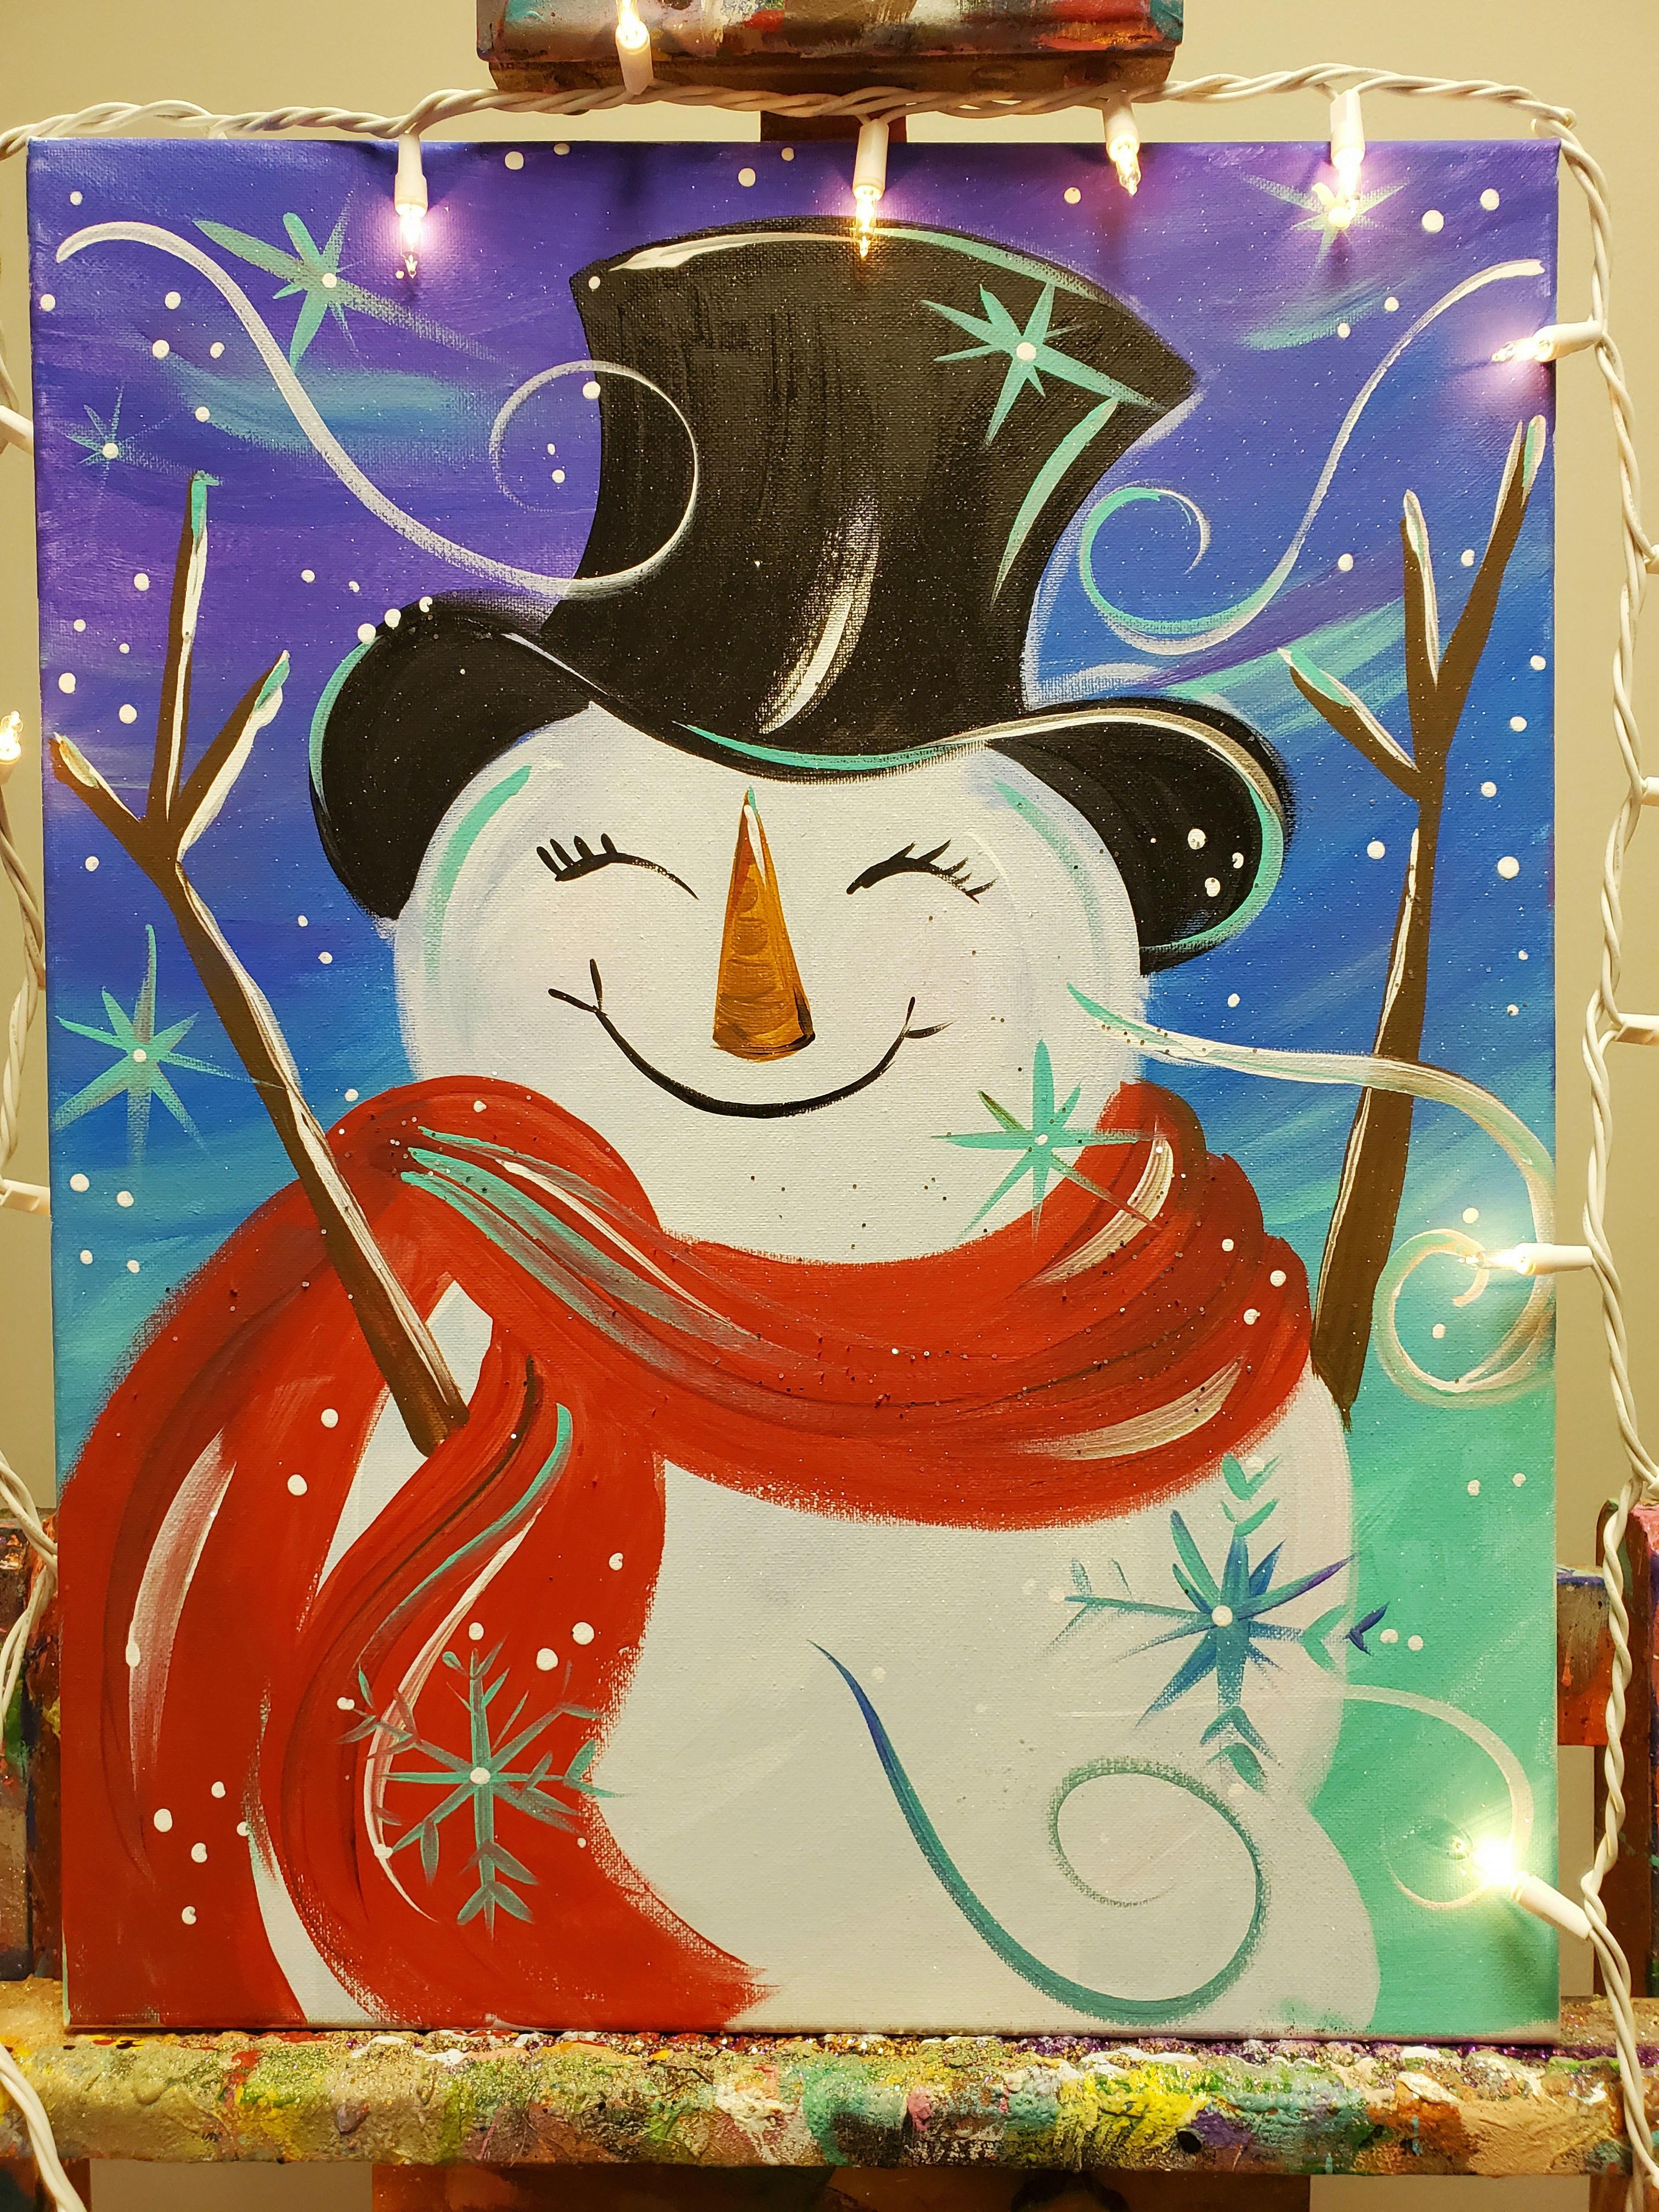 SNOW MAN PARTY!- THURSDAY NIGHT AUG.13th